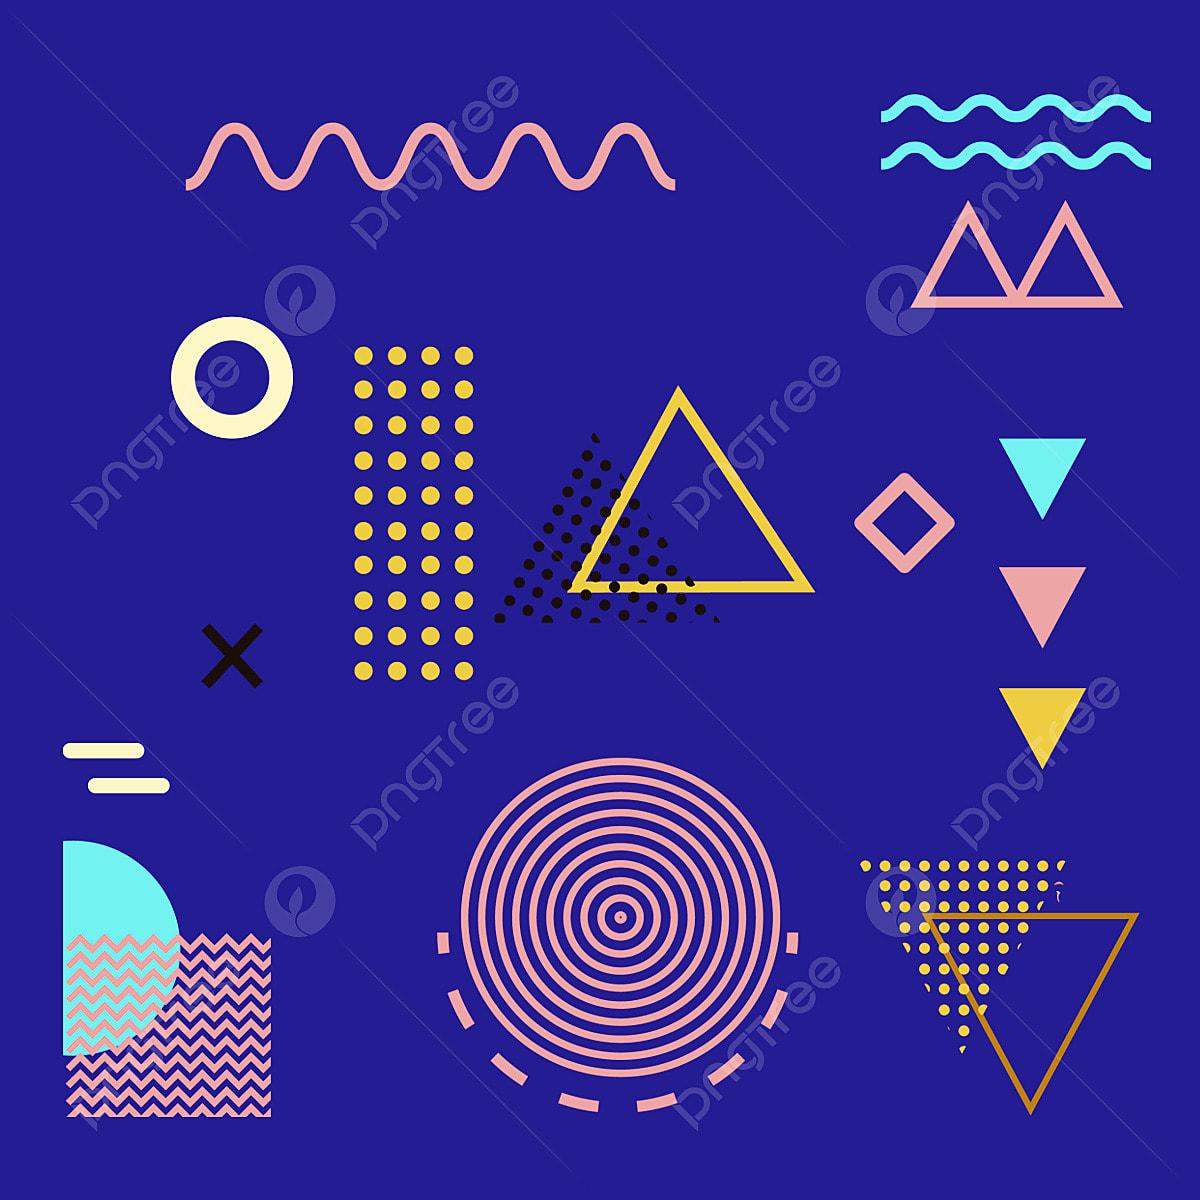 Fresh Irregular Geometric Patterns Triangle Irregular Geometry Memphis Png Transparent Clipart Image And Psd File For Free Download,Season 2 Cast Of Designated Survivor